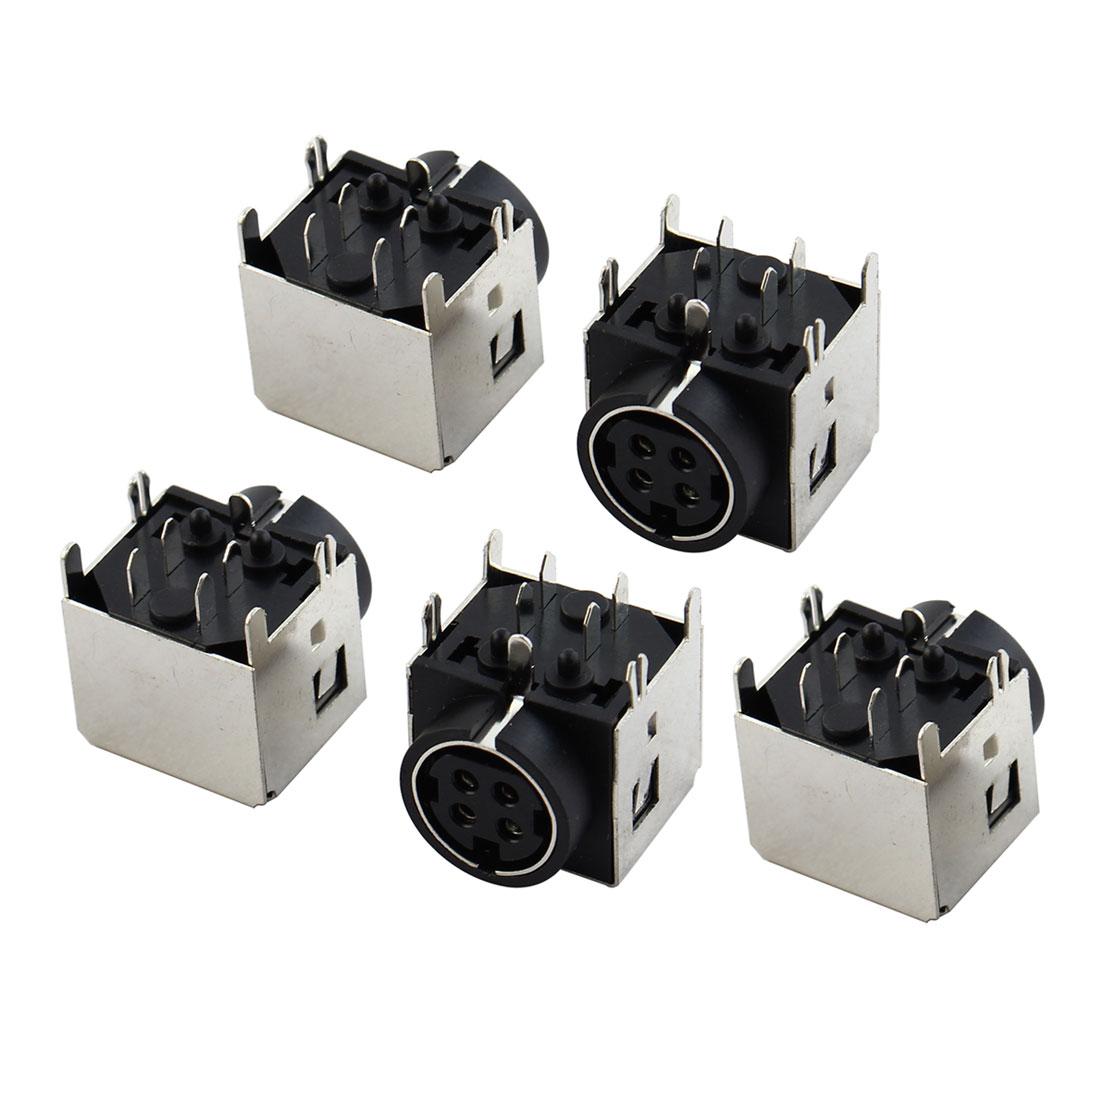 5 Pcs DC Female 4 Pin Mini DIN Power Jacks Sockets for Gateway M350 M675 M350WVN